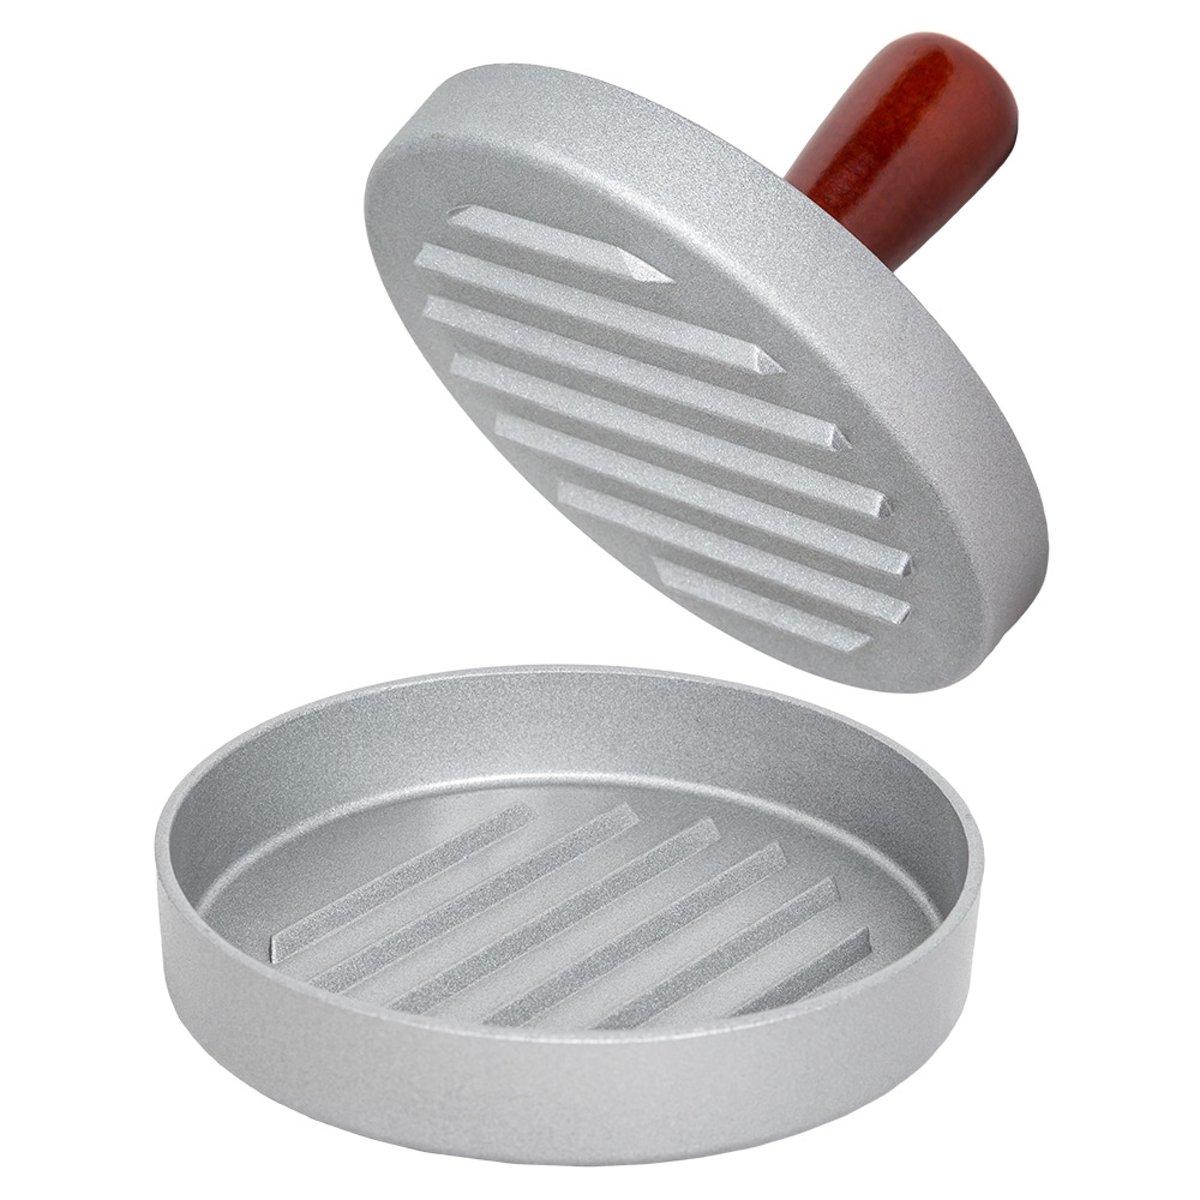 Tectake Hamburgerpers - BBQ Grill kopen